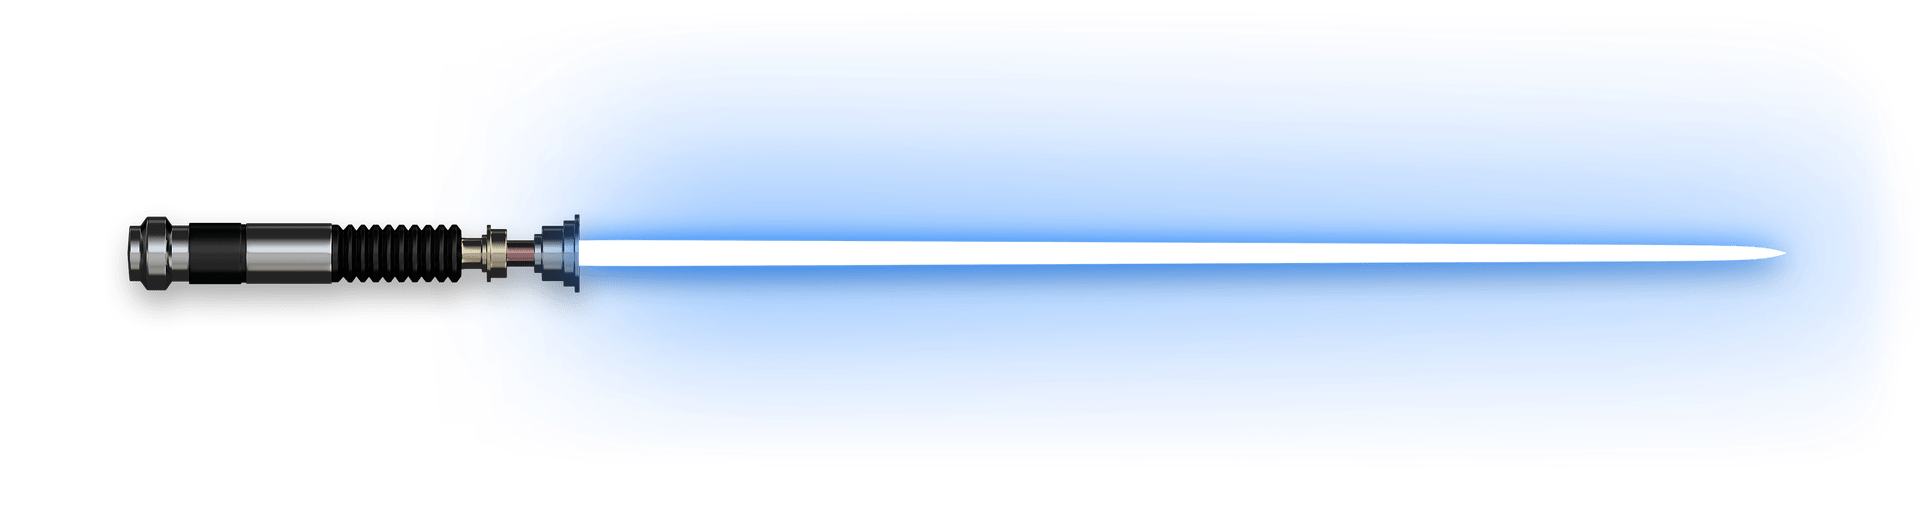 star-wars-2369317_1920